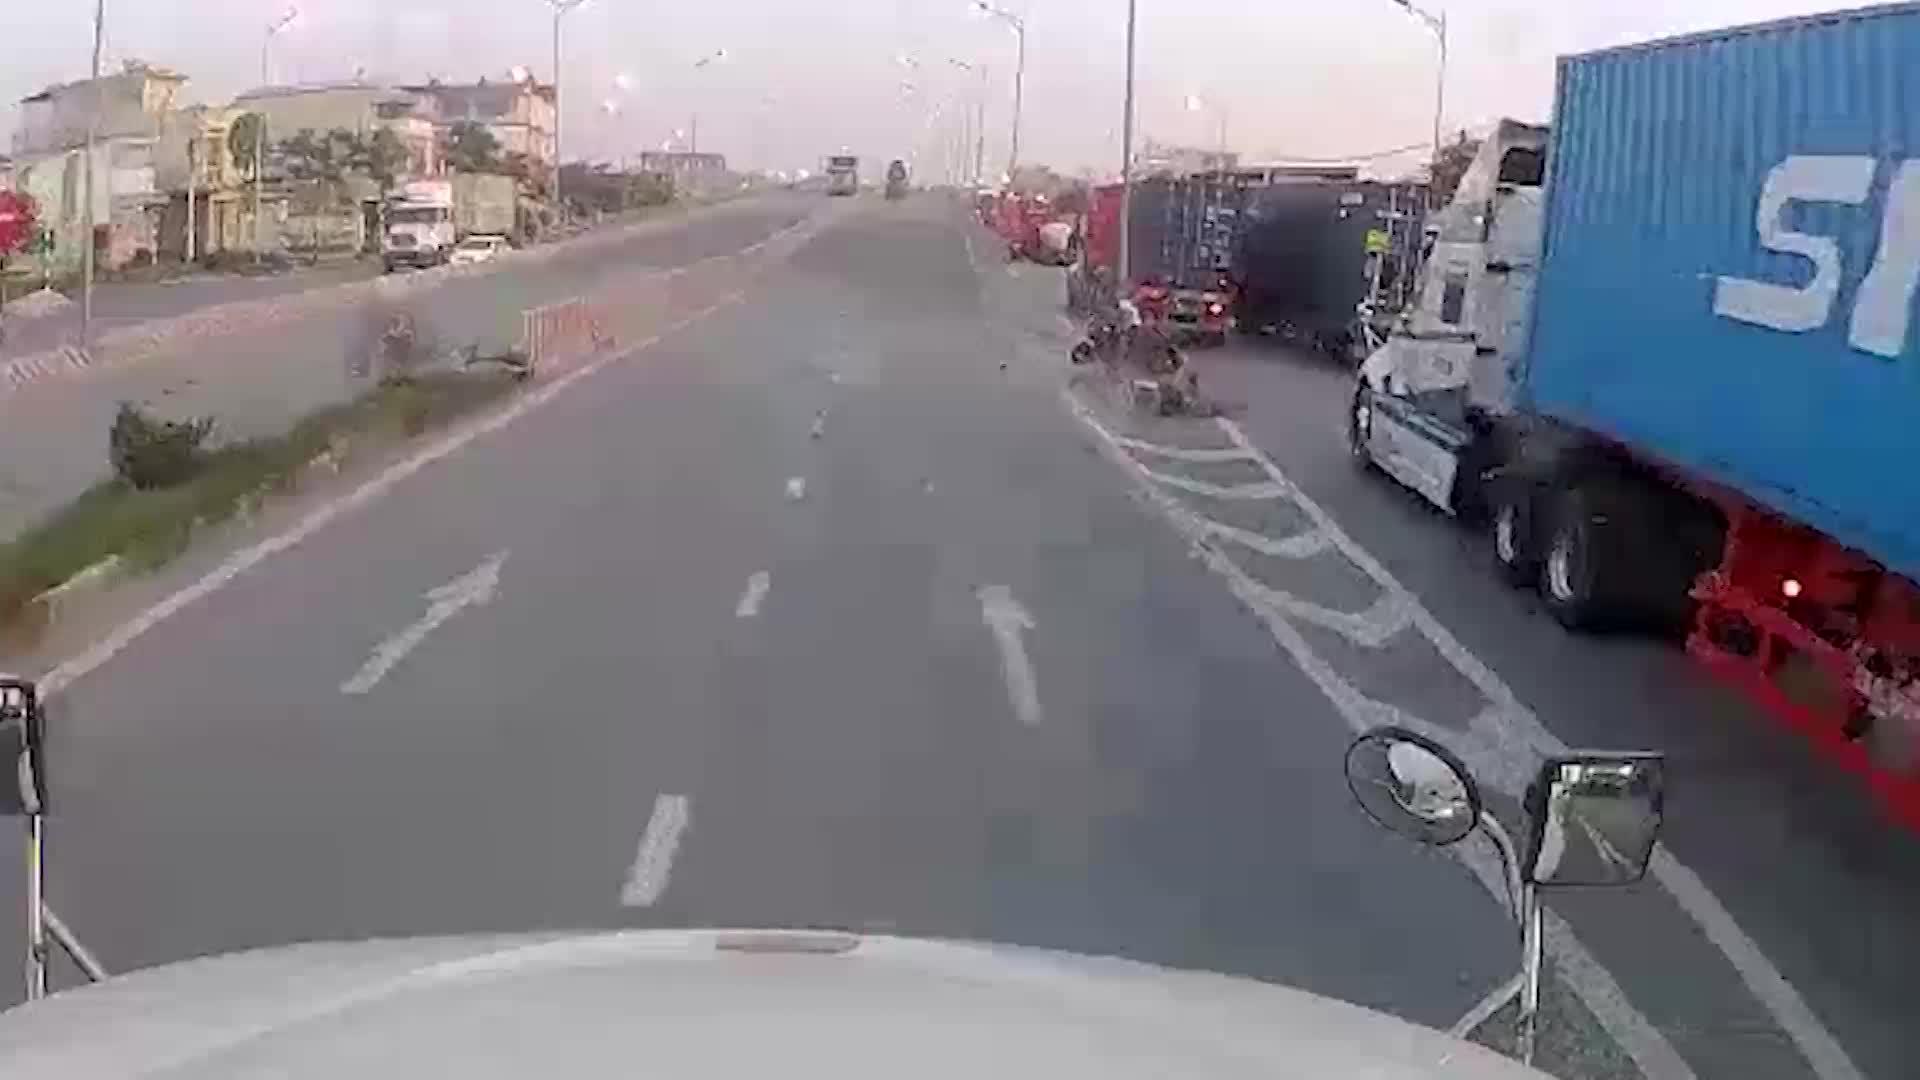 video 2 thanh nien suyt chet vi tat dau hang loat container